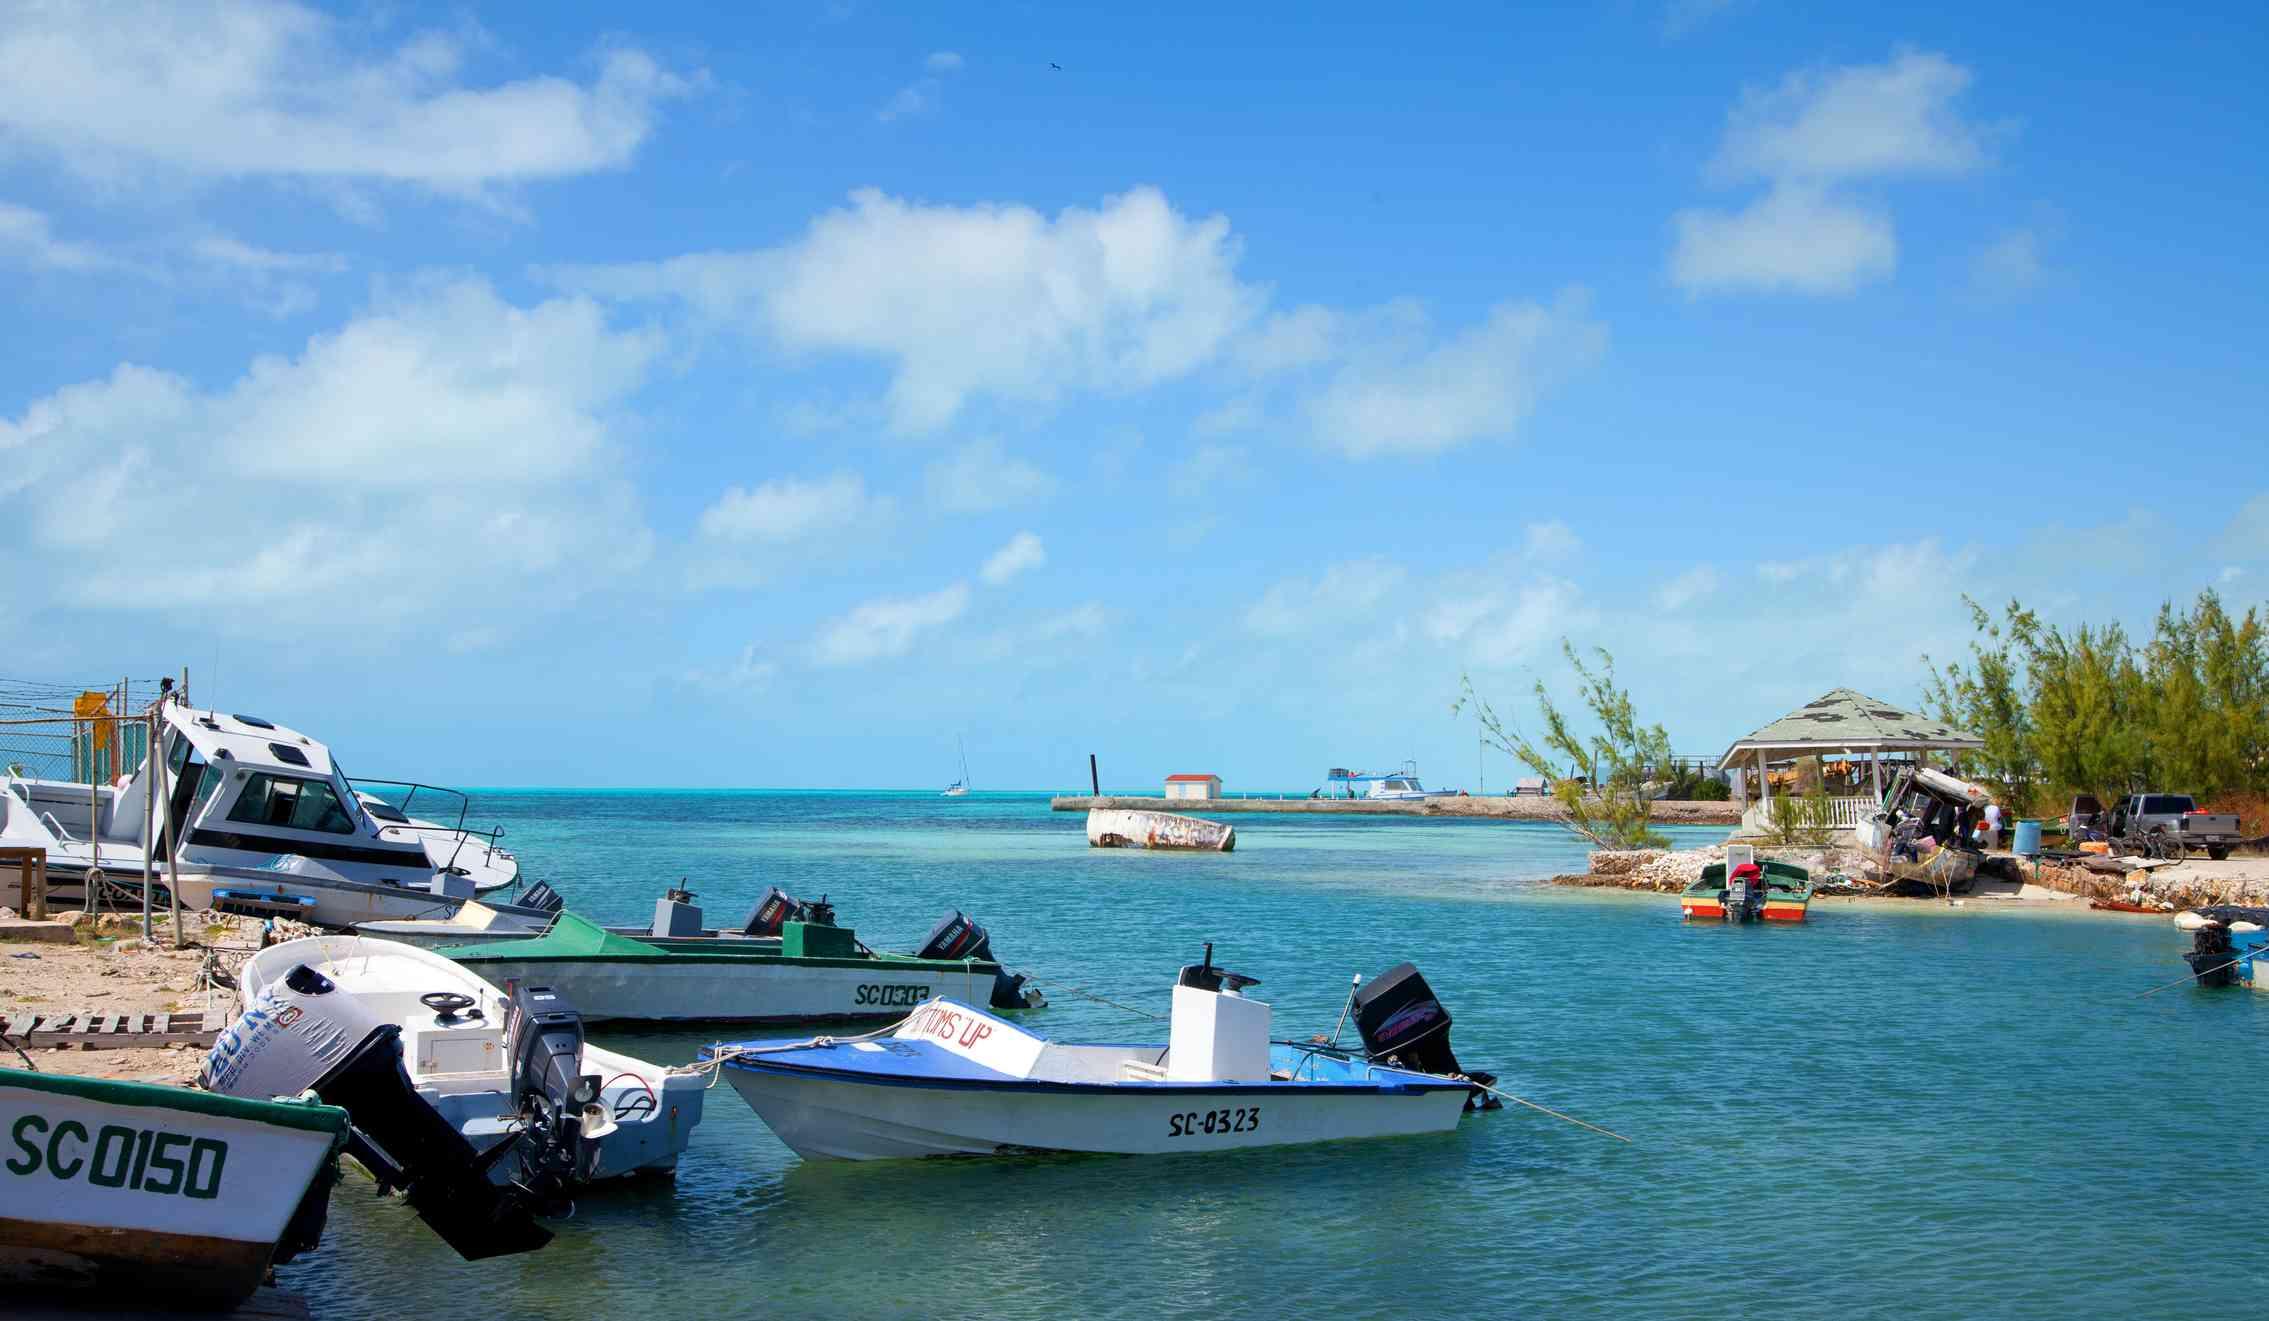 Caicos Harbor (South Caicos)